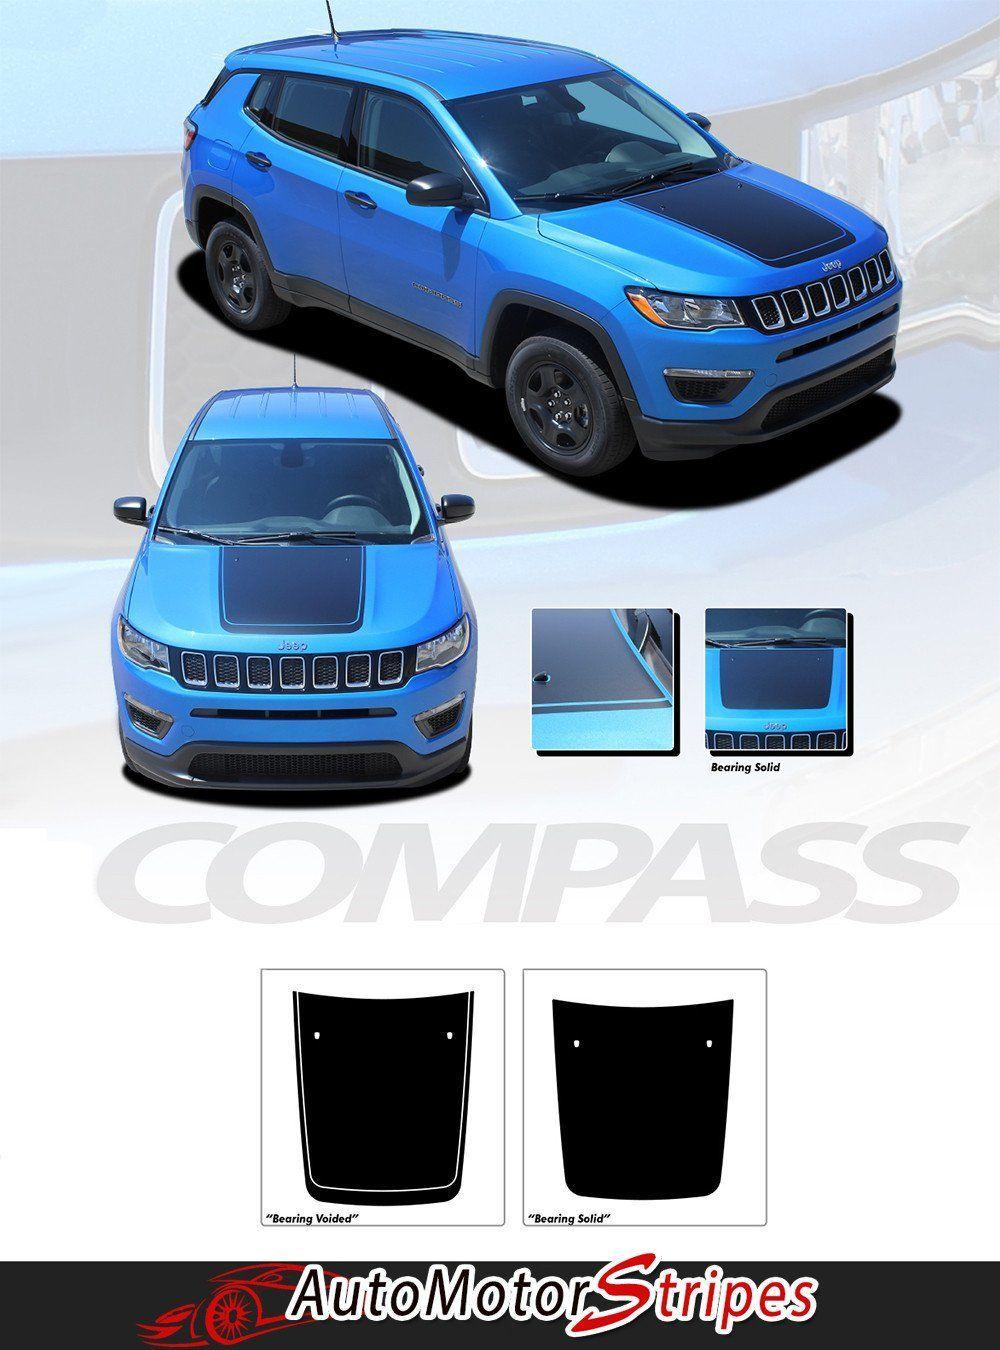 2017 2020 Jeep Compass Hood Stripes Vinyl Graphics Decals Accent 3m Bearing Jeep Compass Vinyl Graphics Jeep